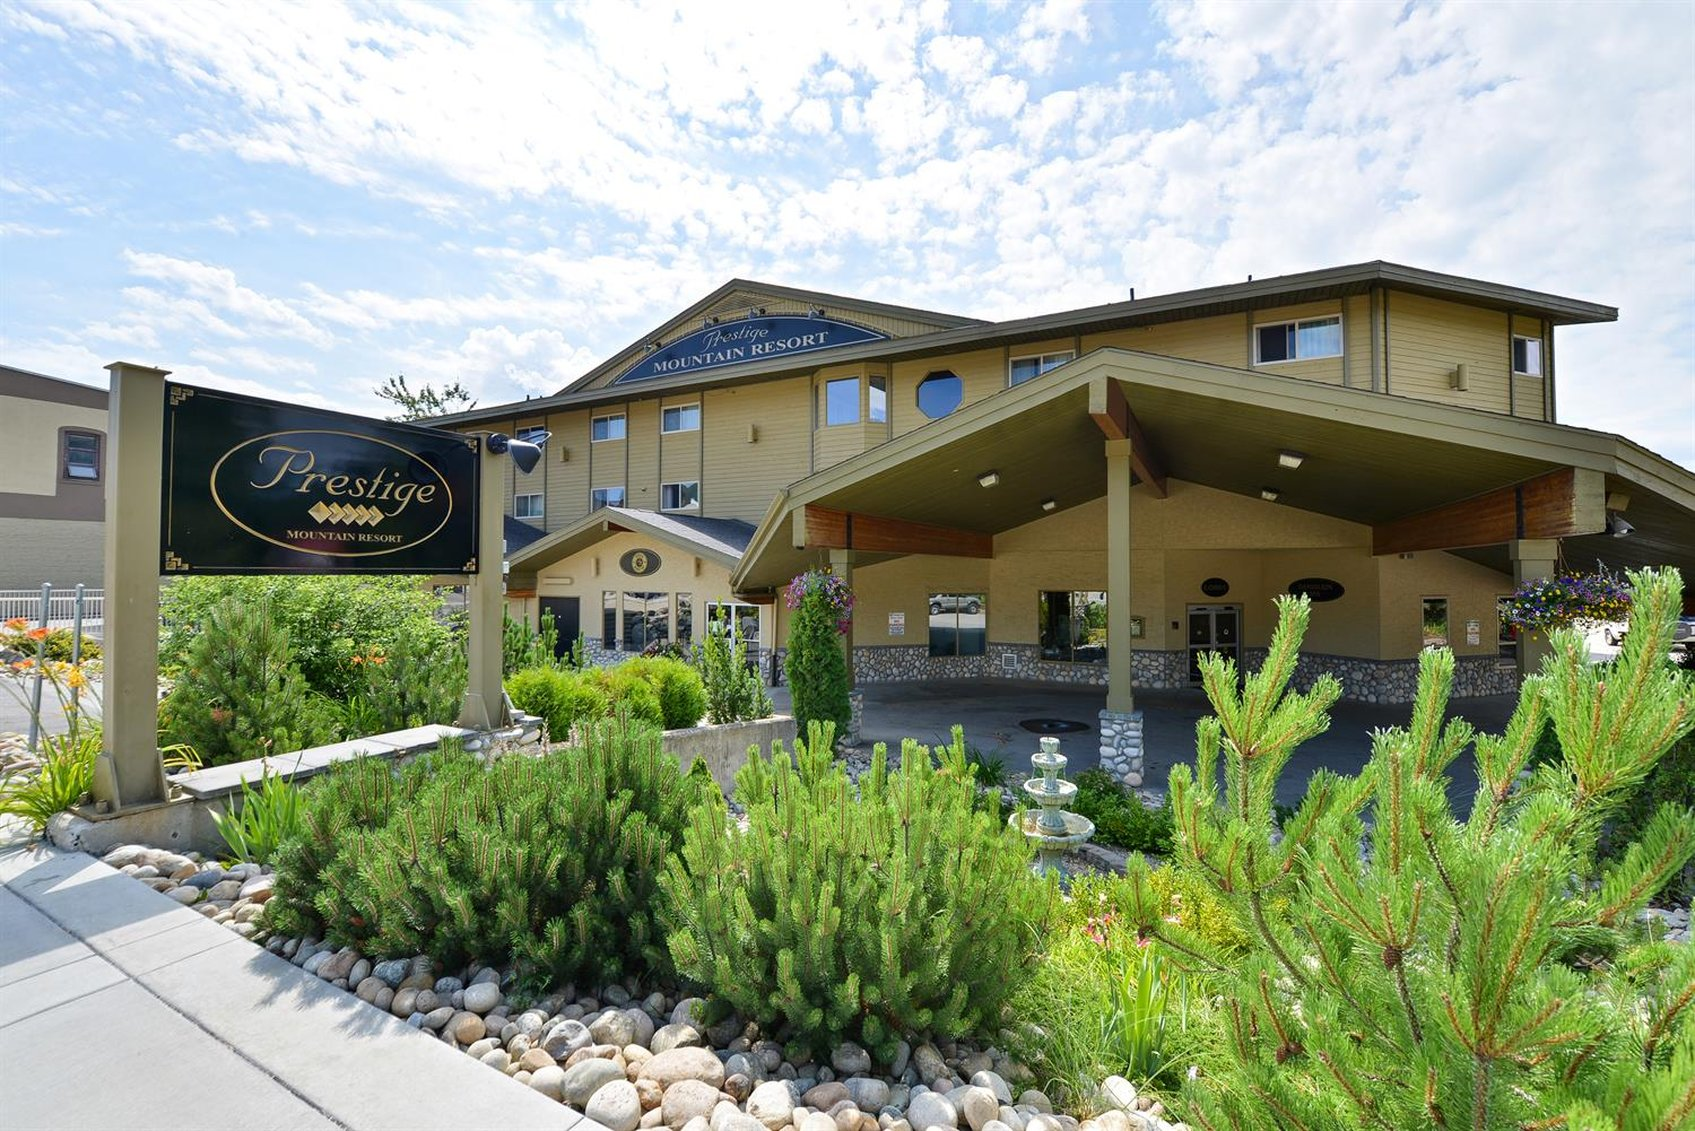 The Prestige Mountain Resort Rossland